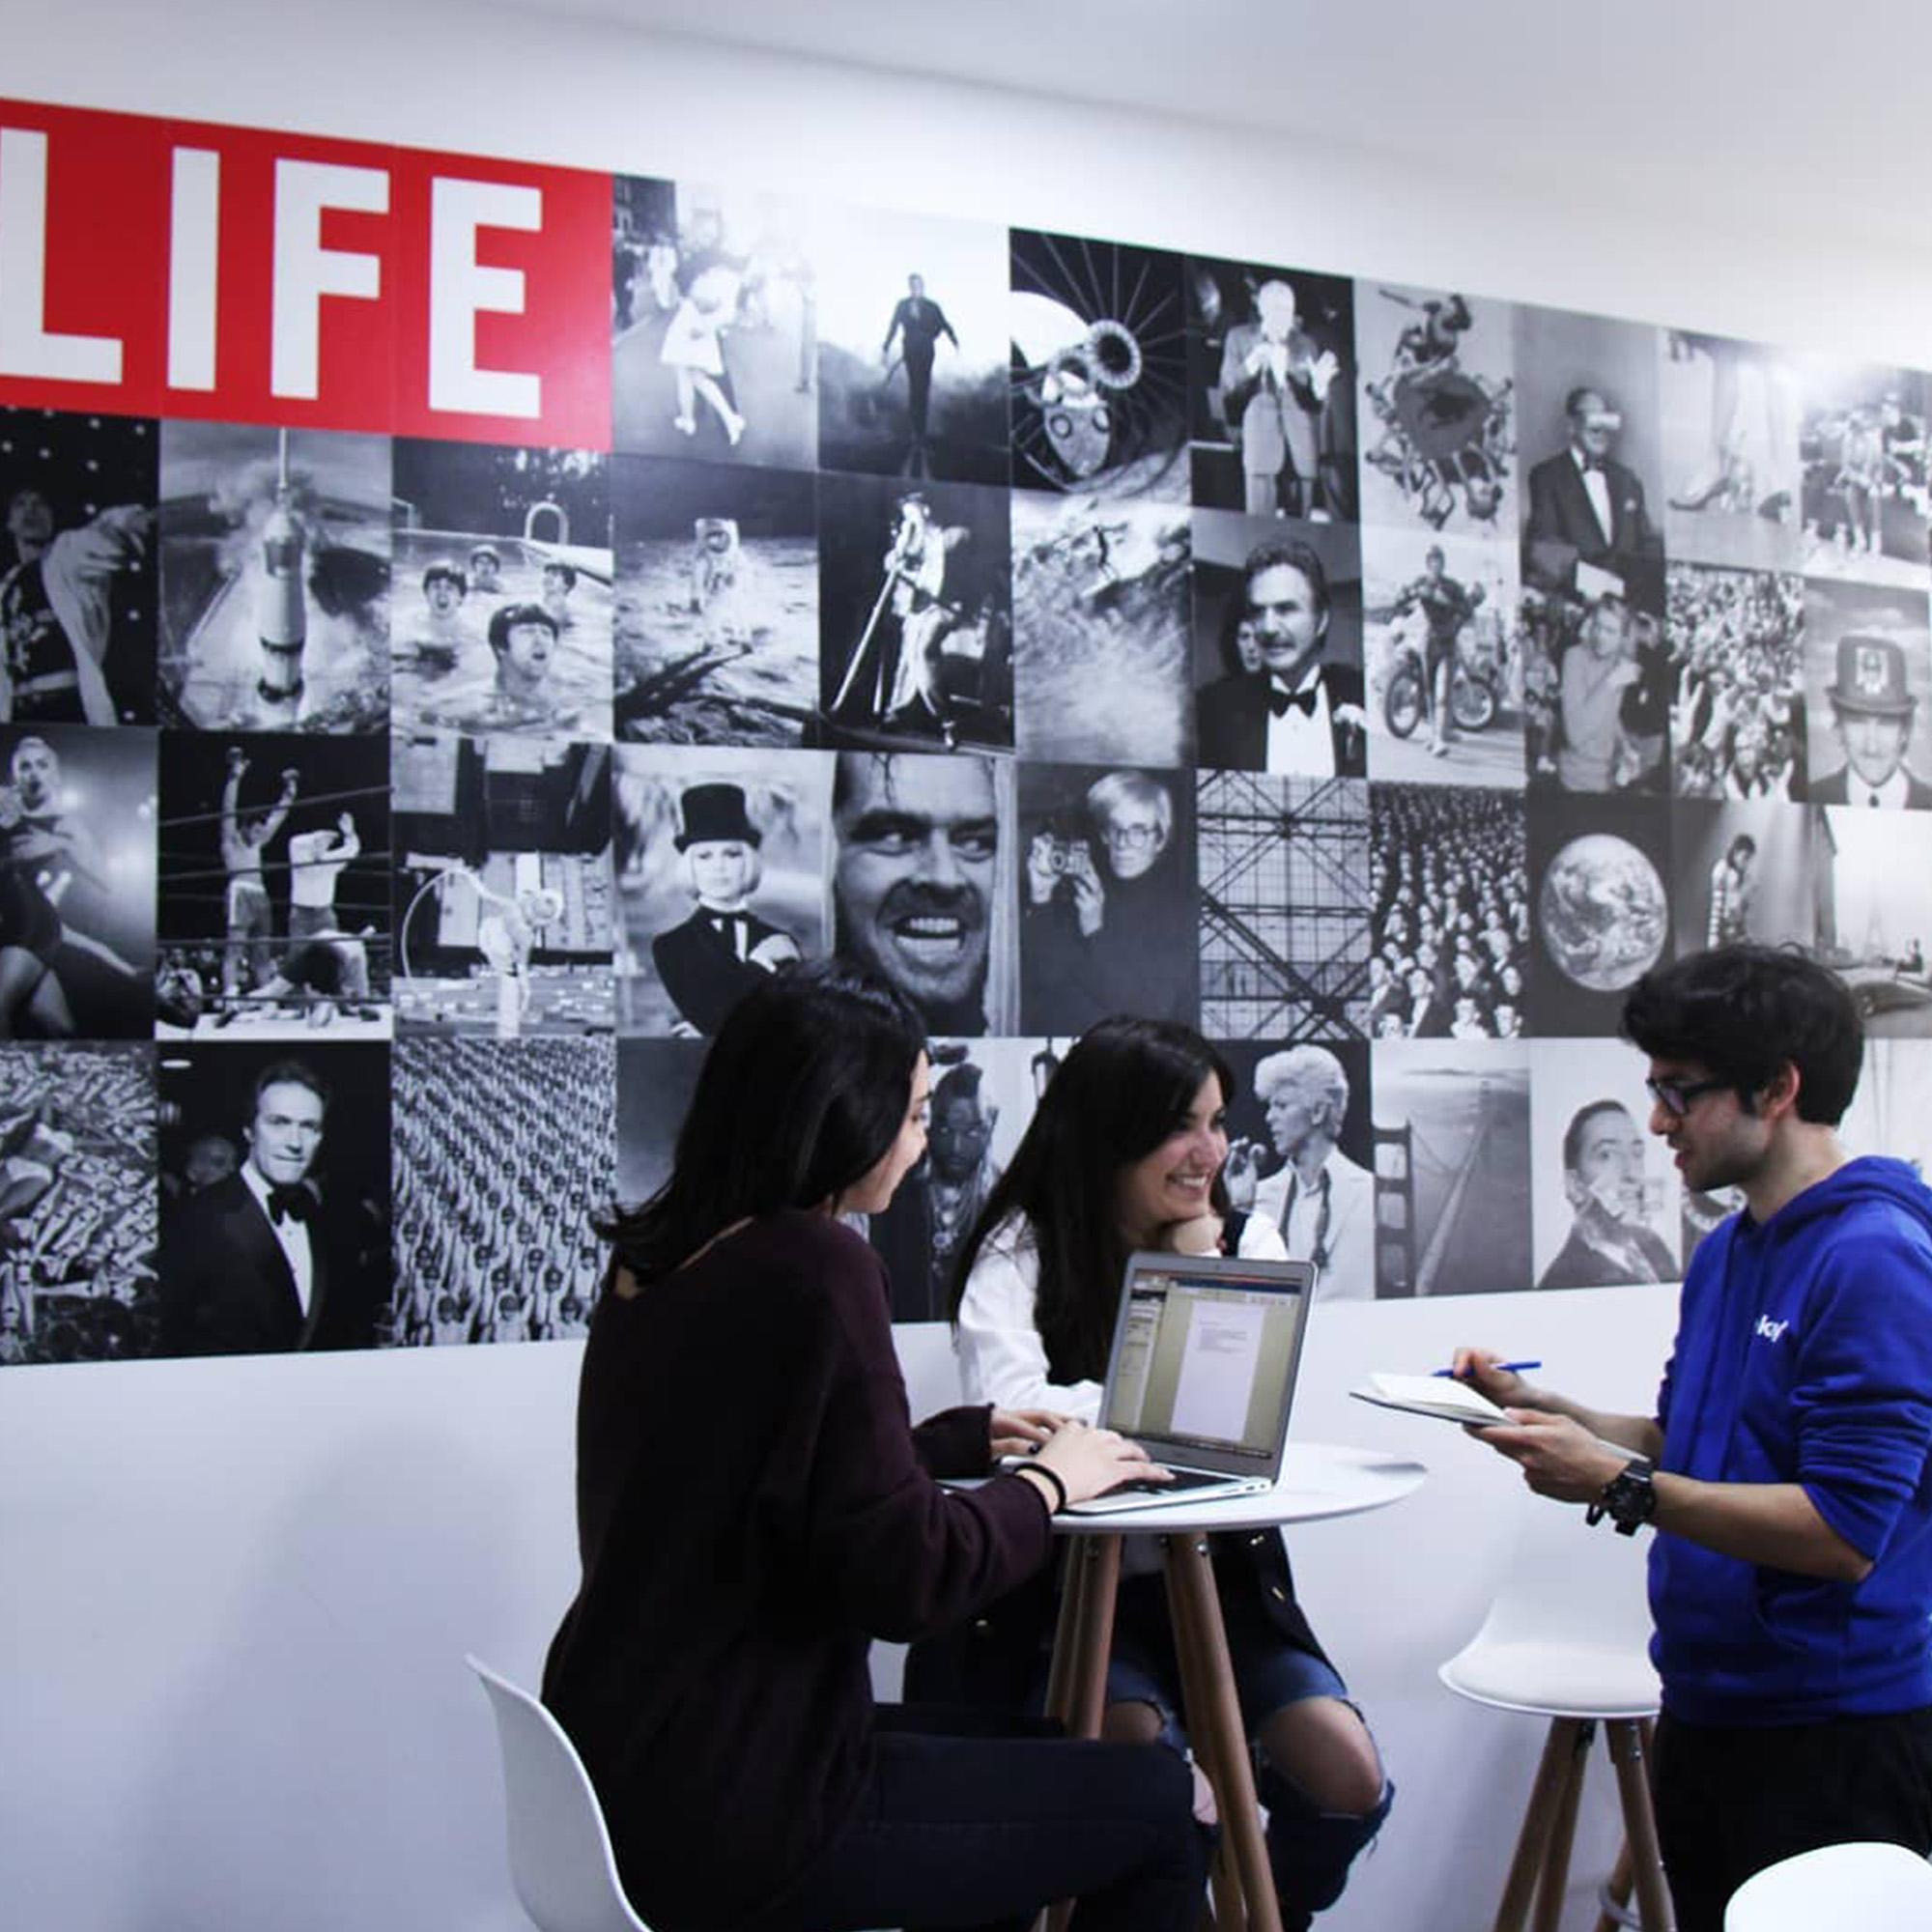 FoundersBei, Beirut